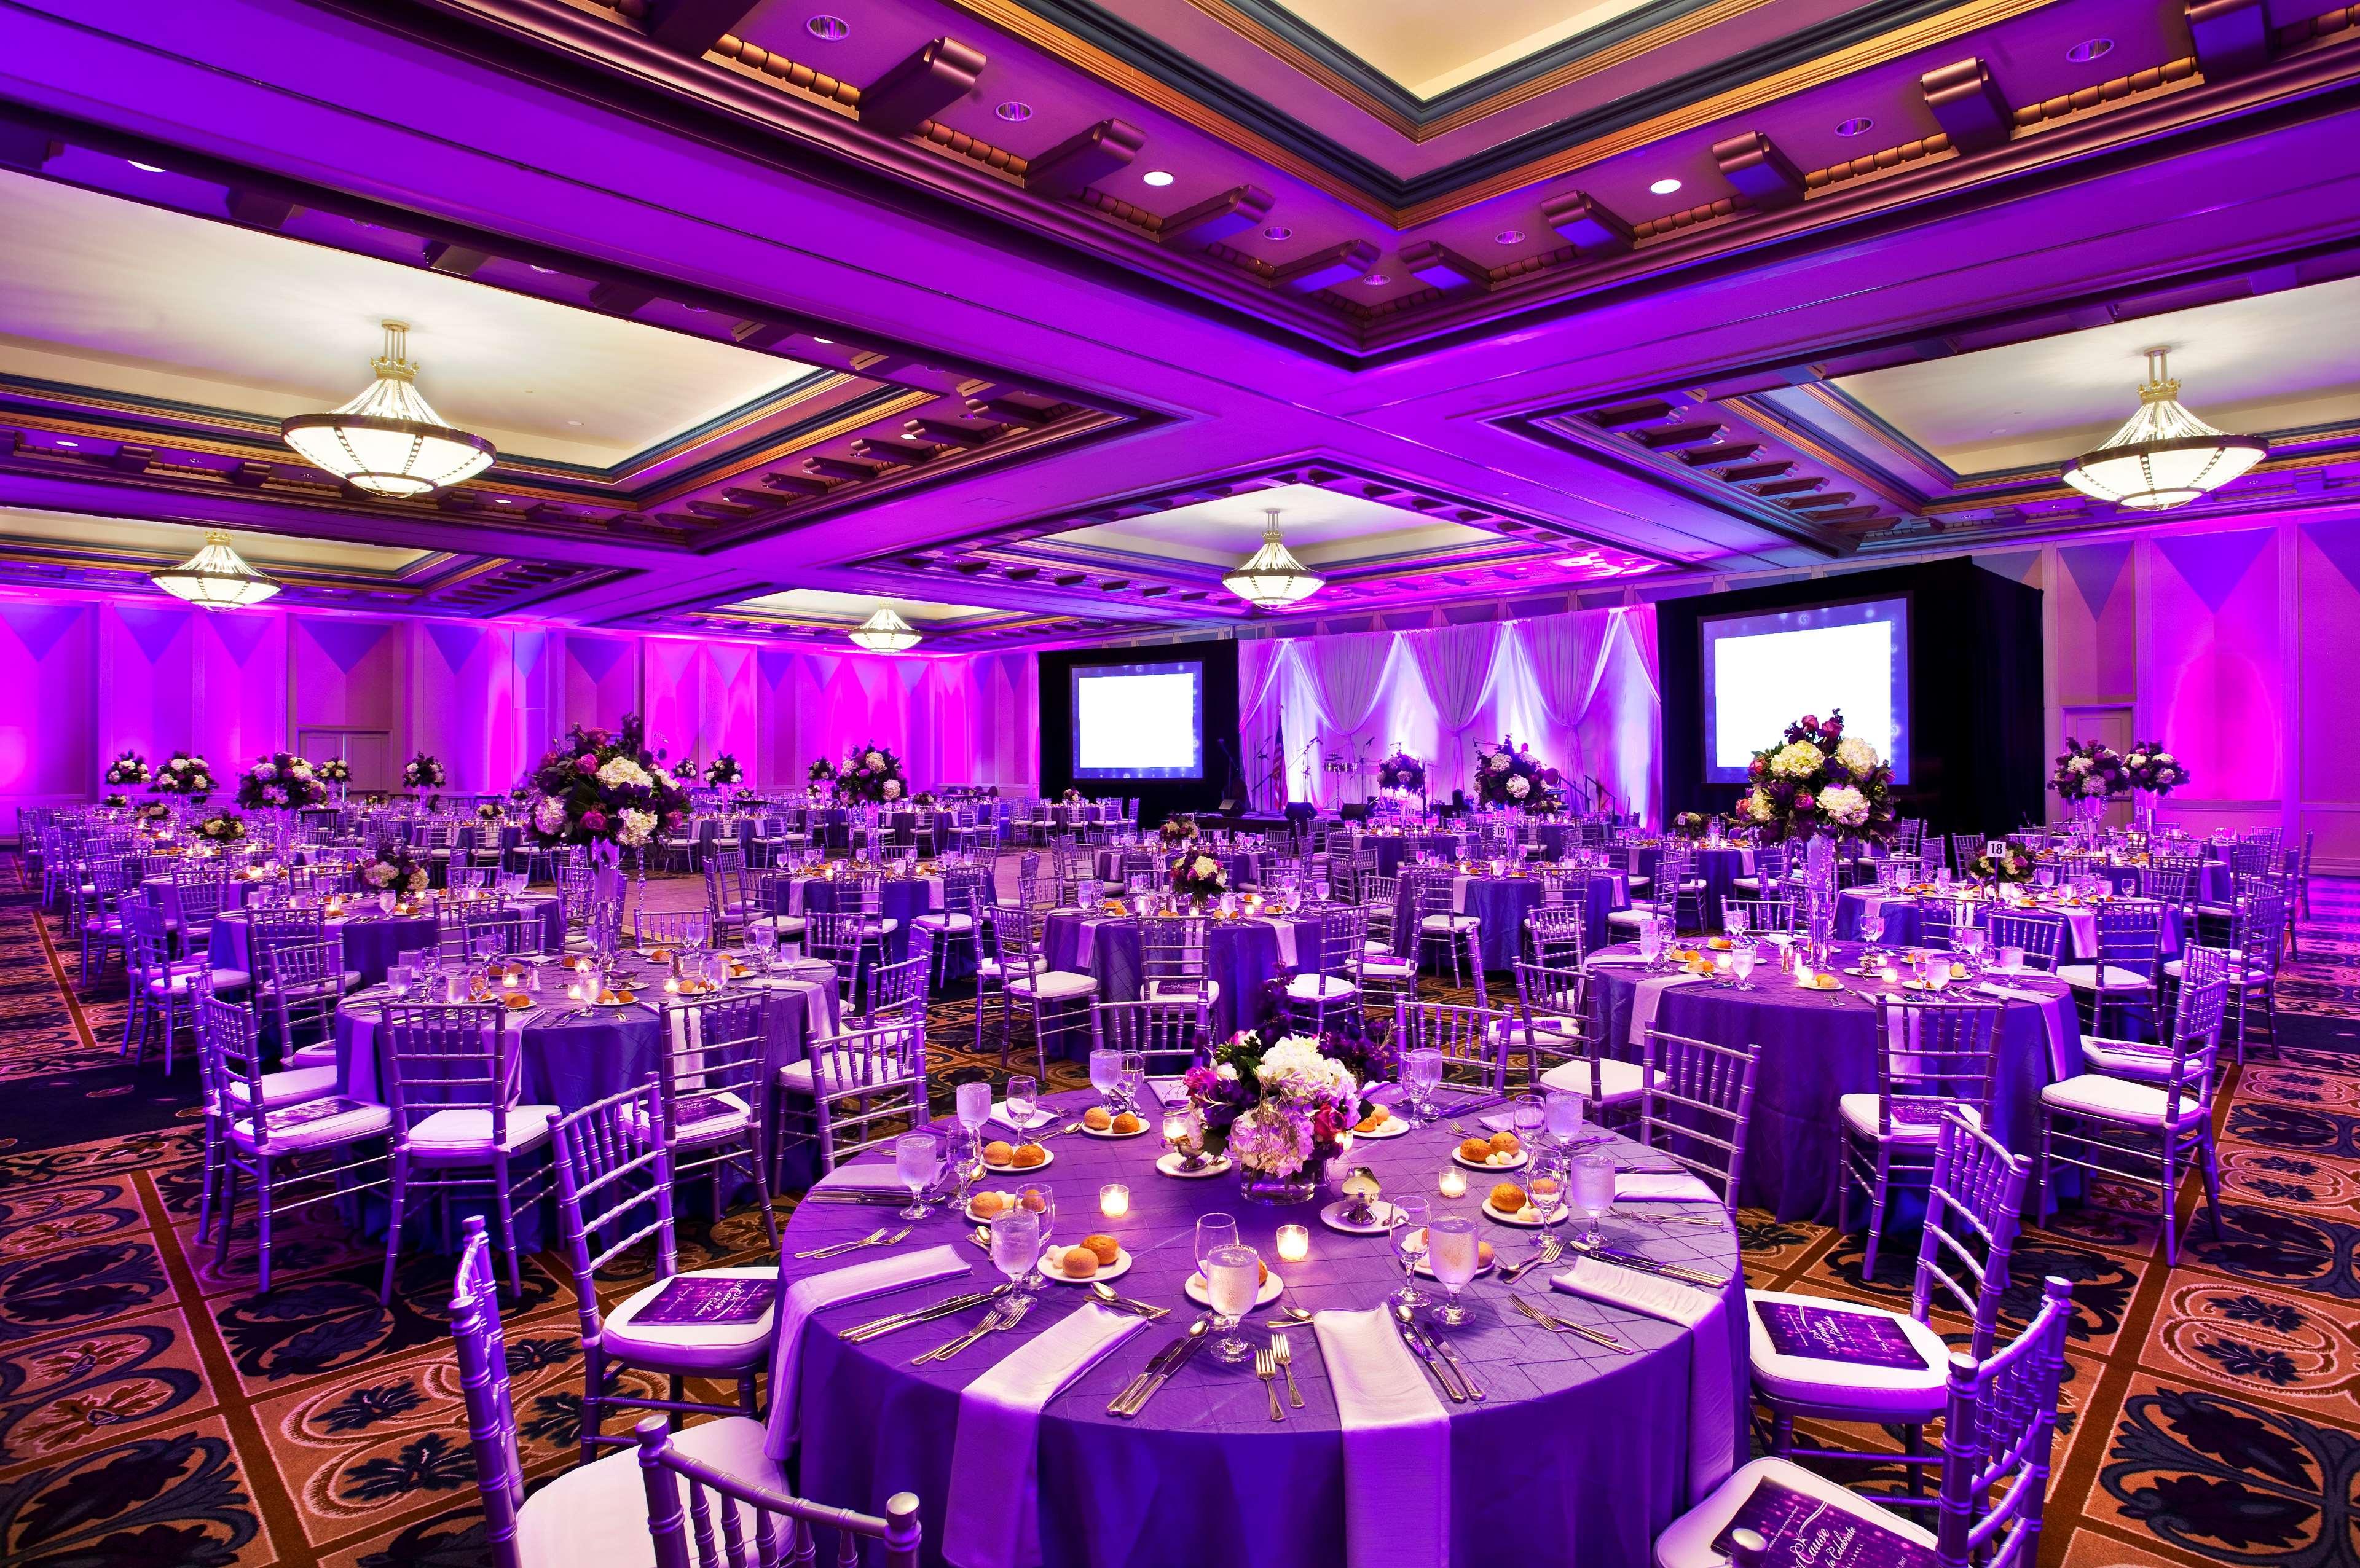 Sheraton Atlantic City Convention Center Hotel image 21